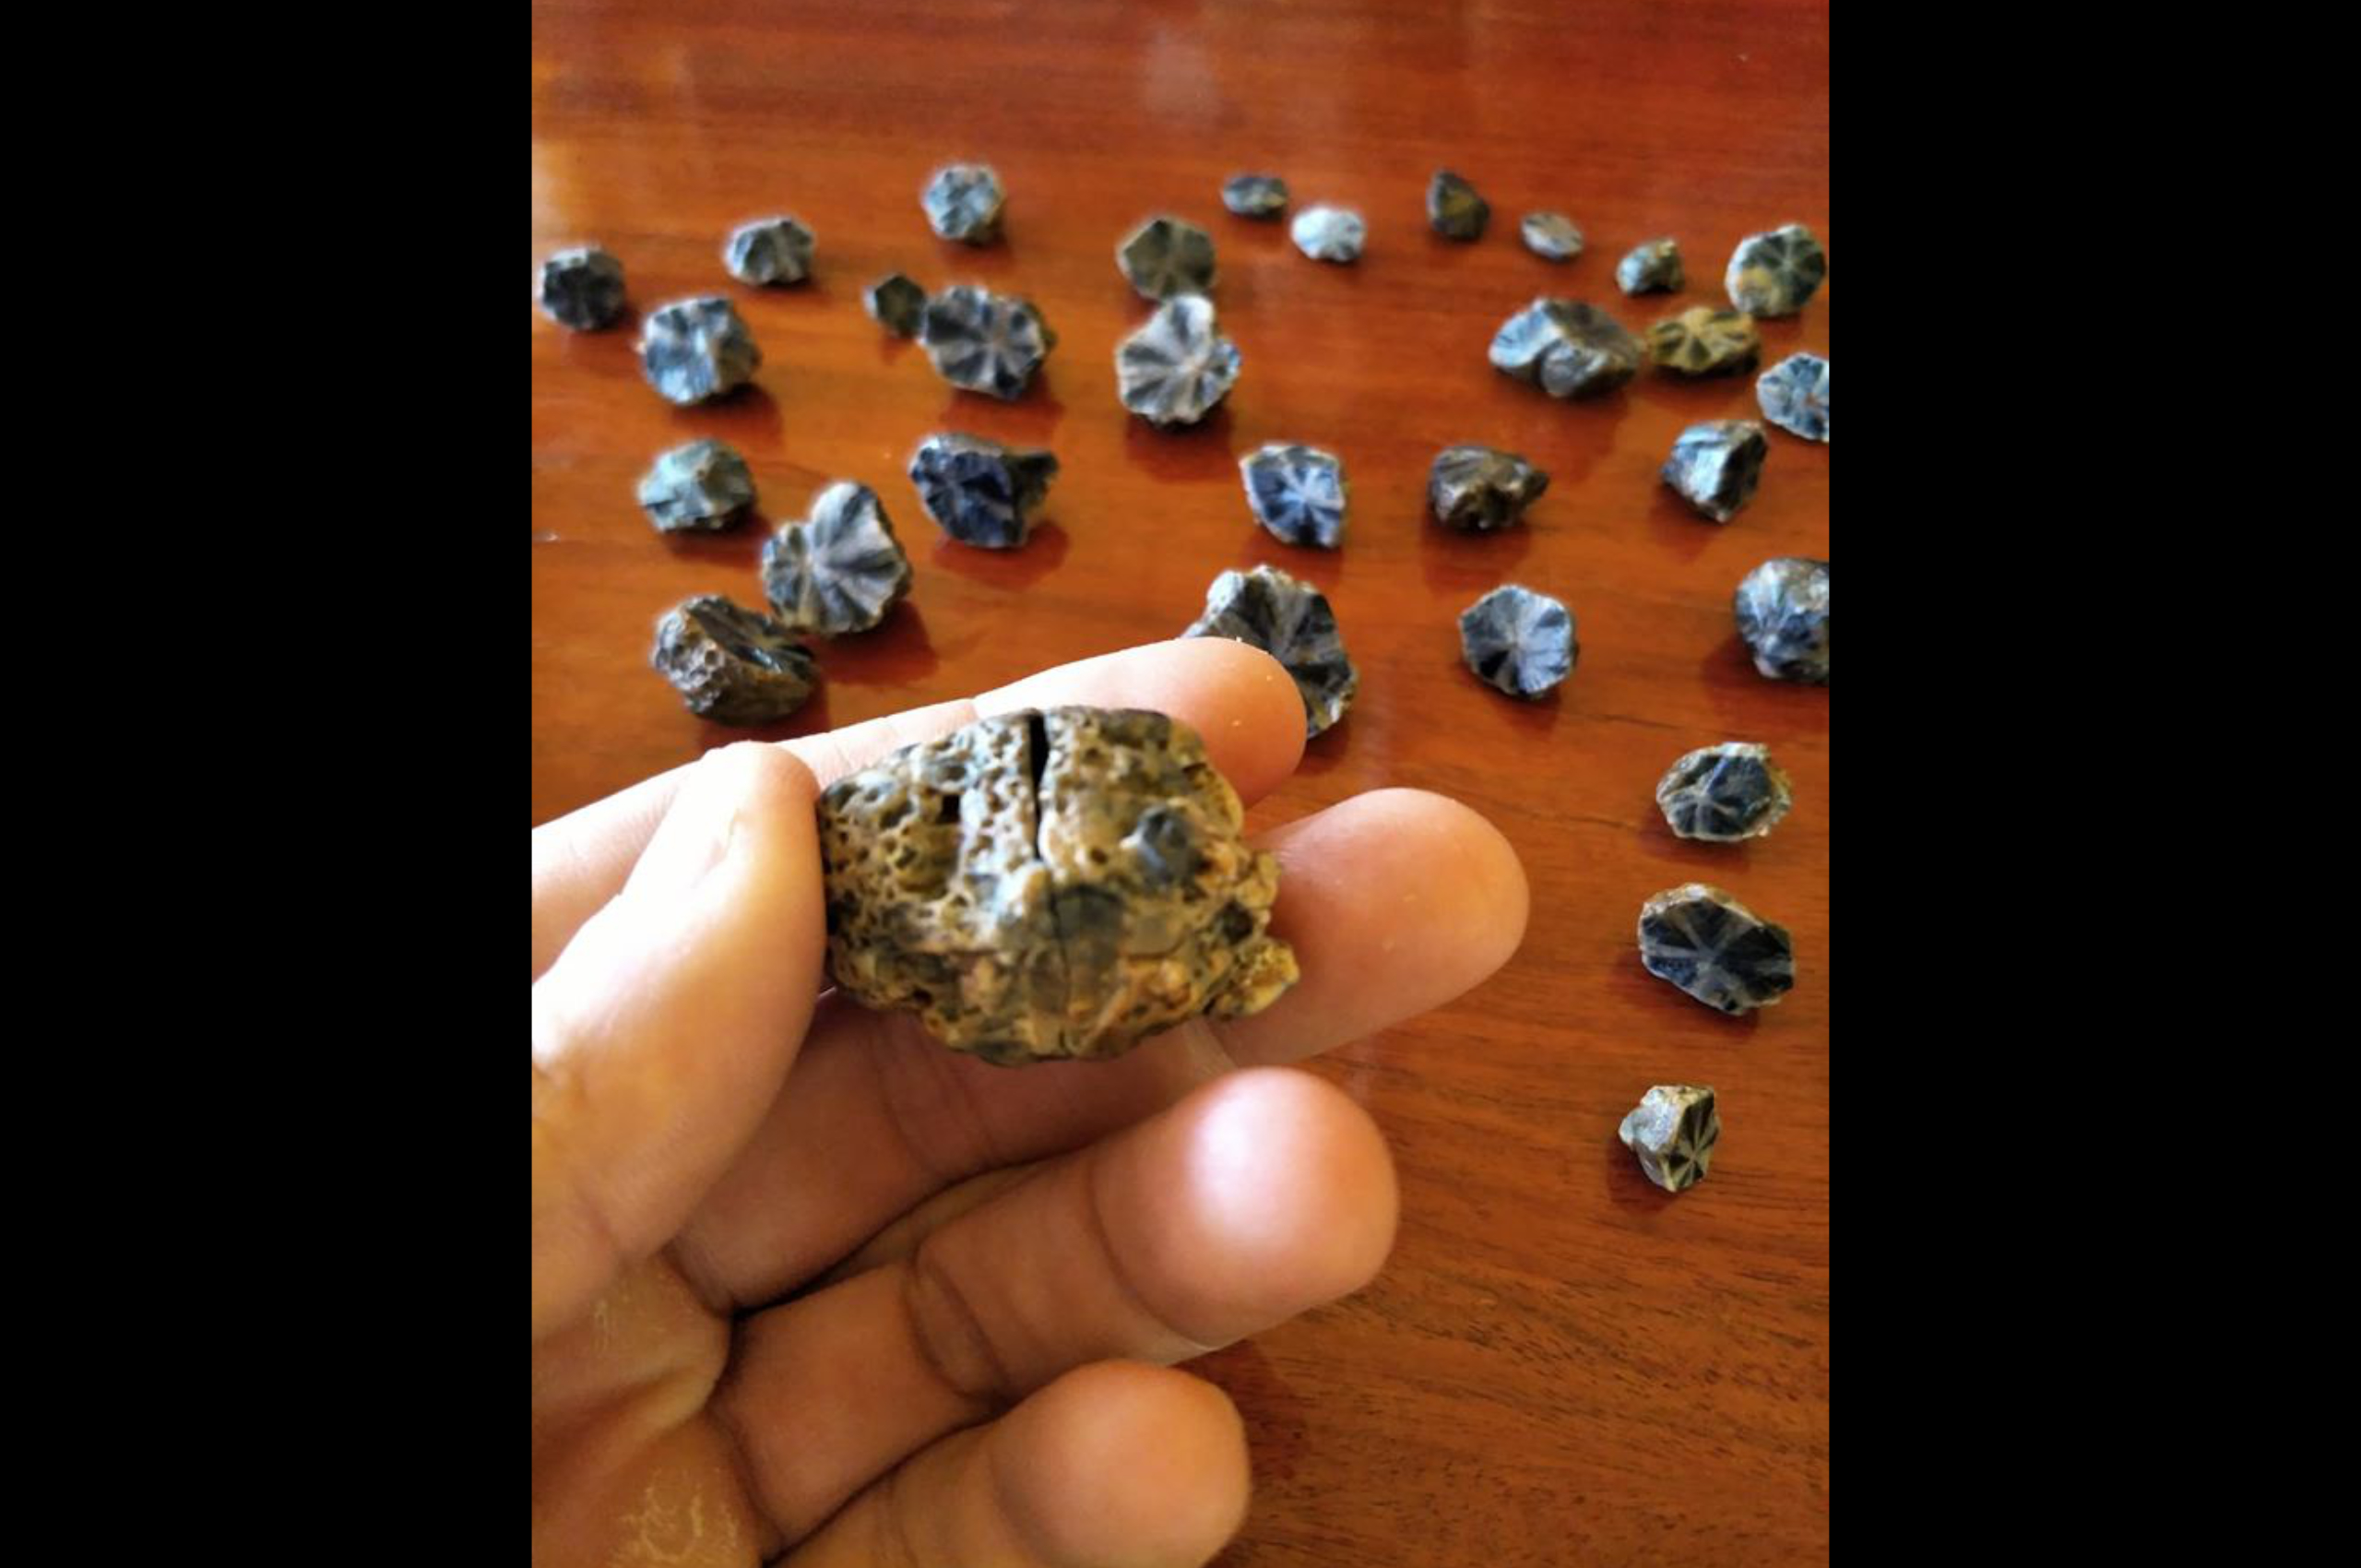 Trapiche-Sapphires-from-Mogok.-Photo-by-Federico-Barlocher